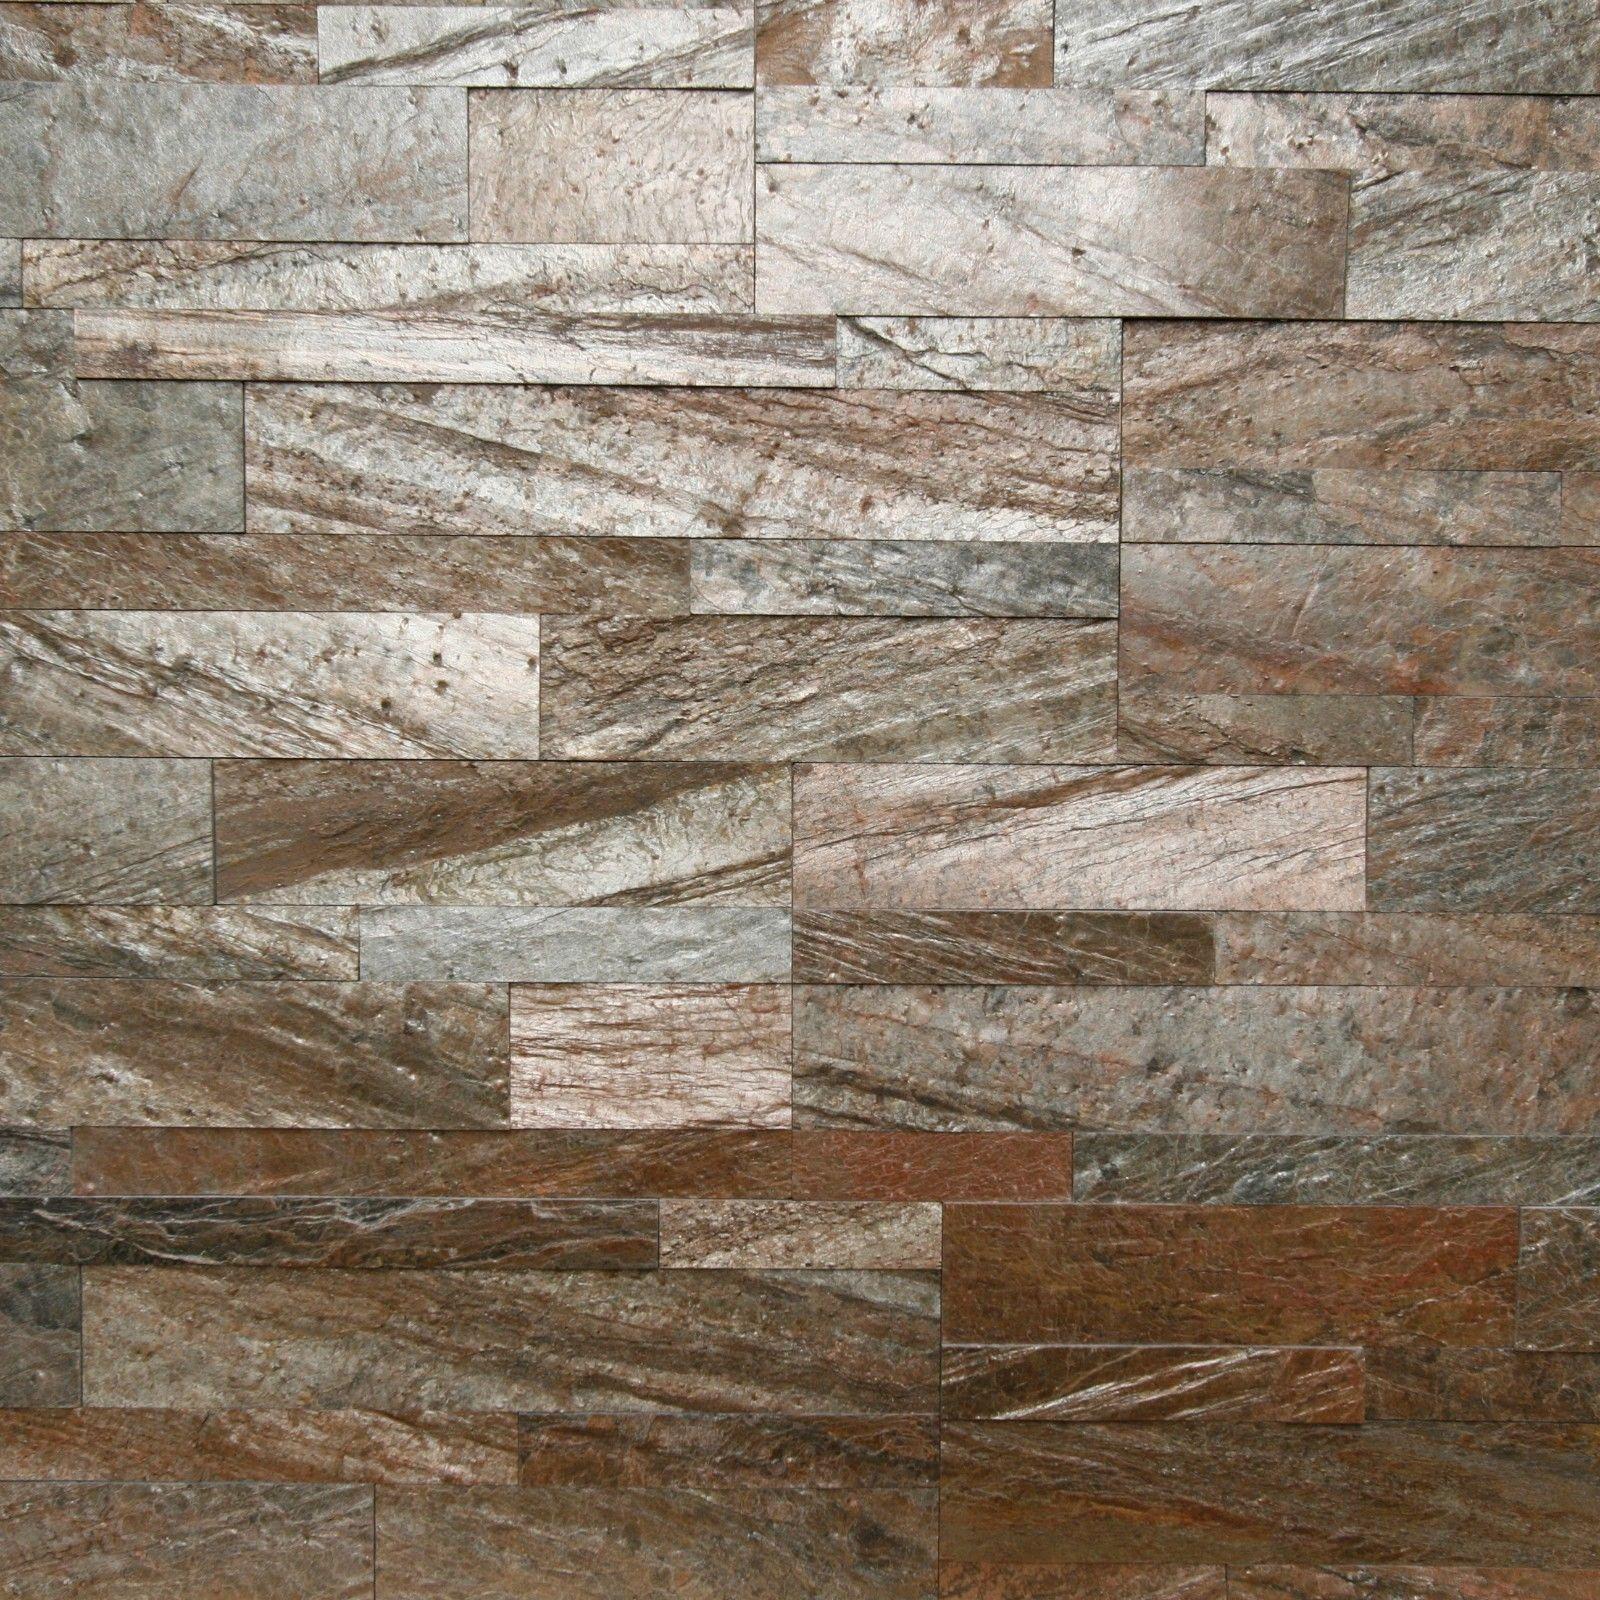 Ultralight Naturstein Verblender 3d Selbstklebend Kupfer Wandverblender Verblender Natursteine Naturstein Verblender